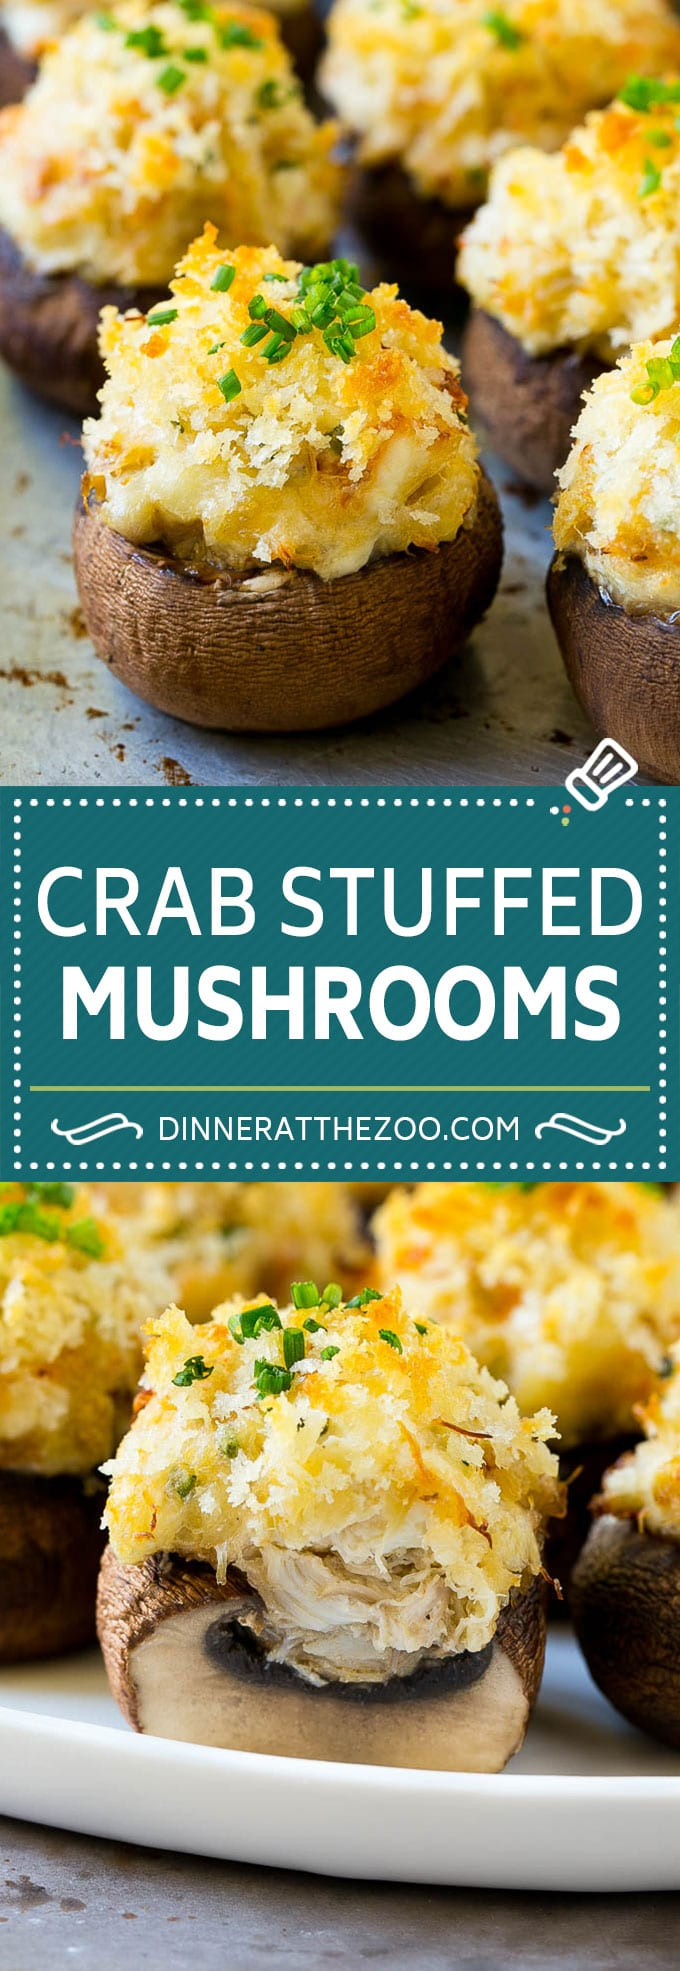 Crab Stuffed Mushrooms Recipe | Stuffed Mushrooms | Mushroom Appetizer #crab #seafood #mushrooms #lowcarb #appetizer #dinneratthezoo